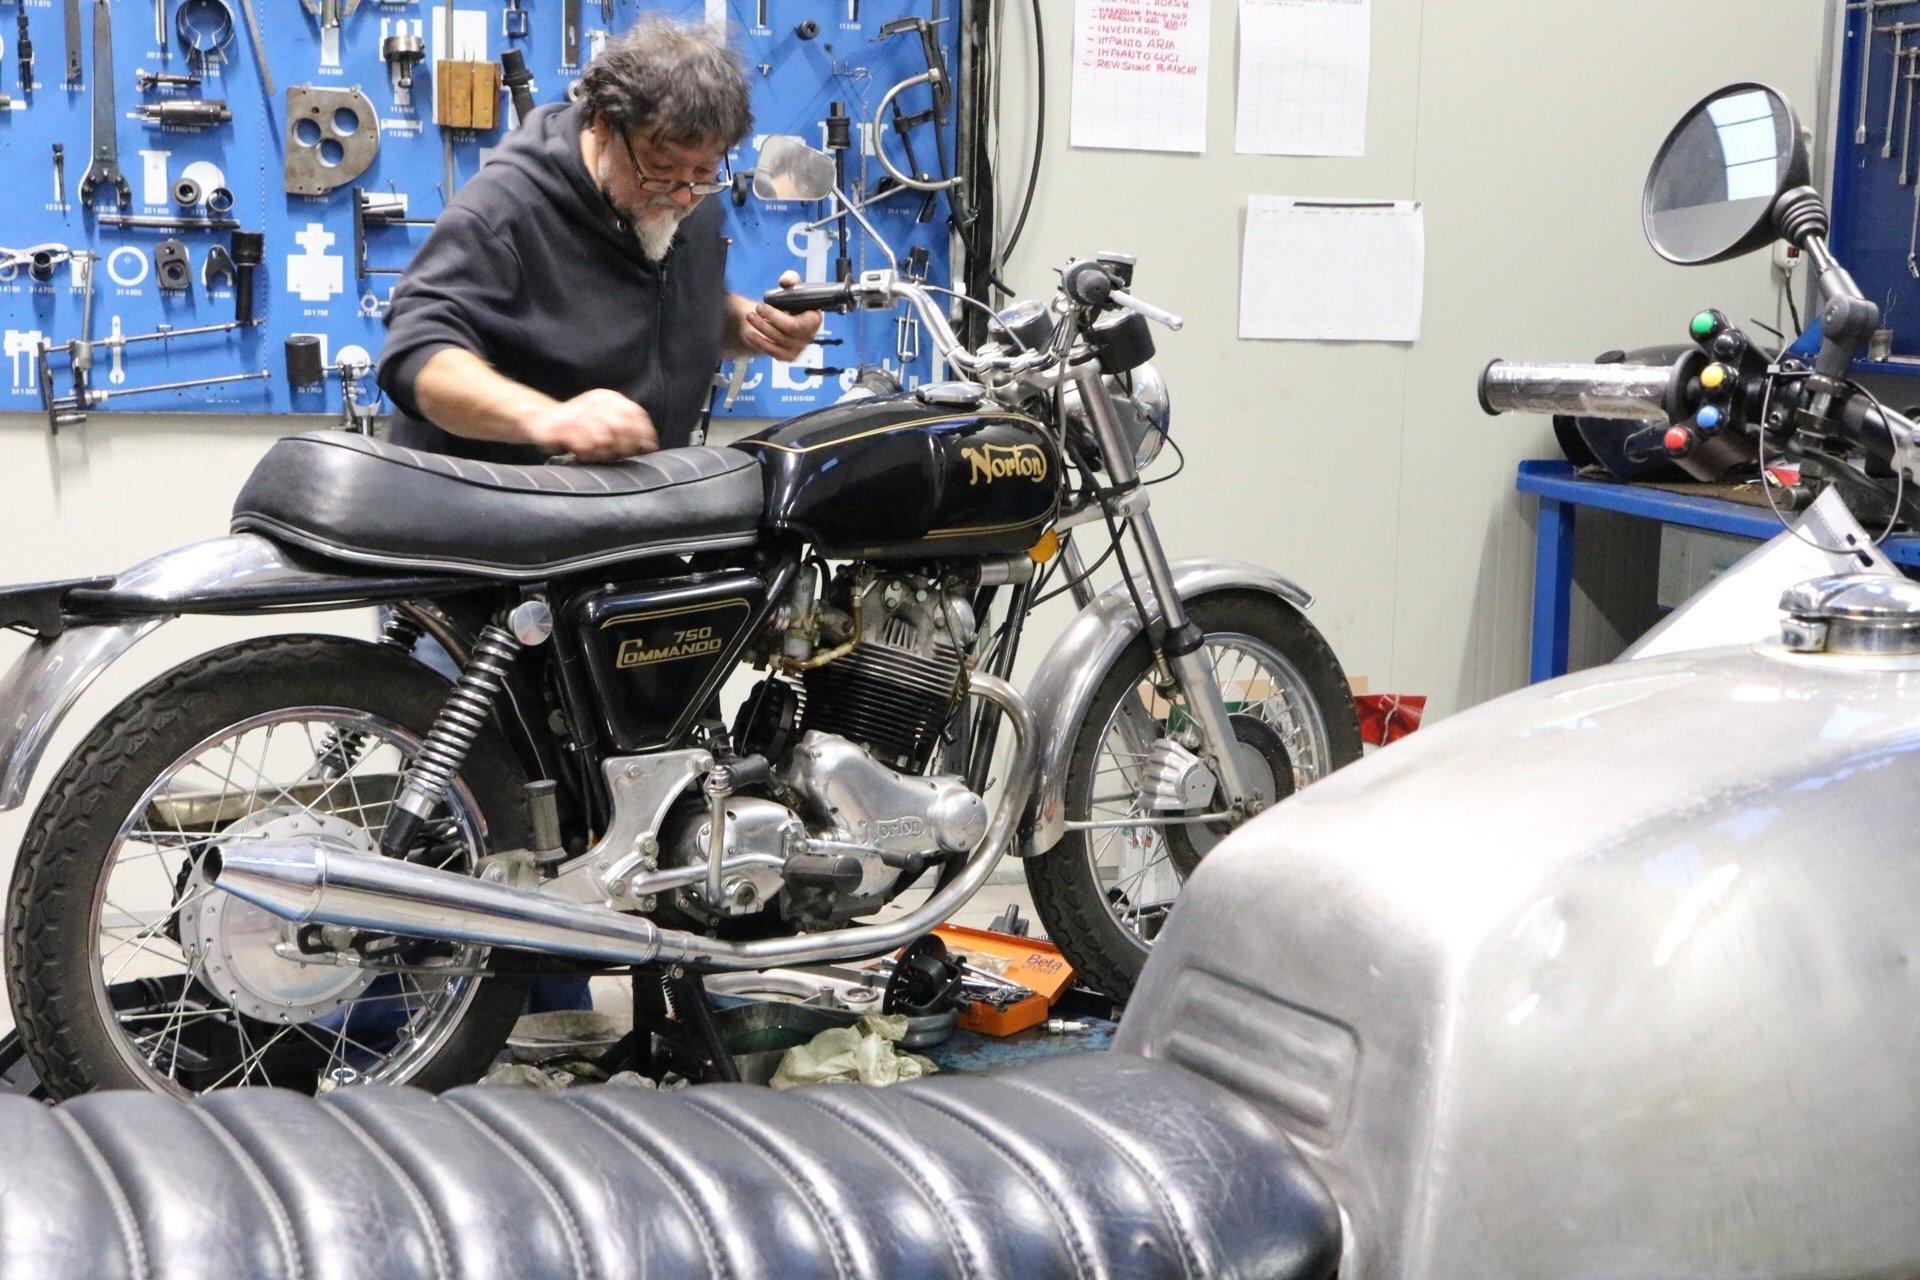 Rimessa in moto Norton Commando Firenze Toscana Officina Moto